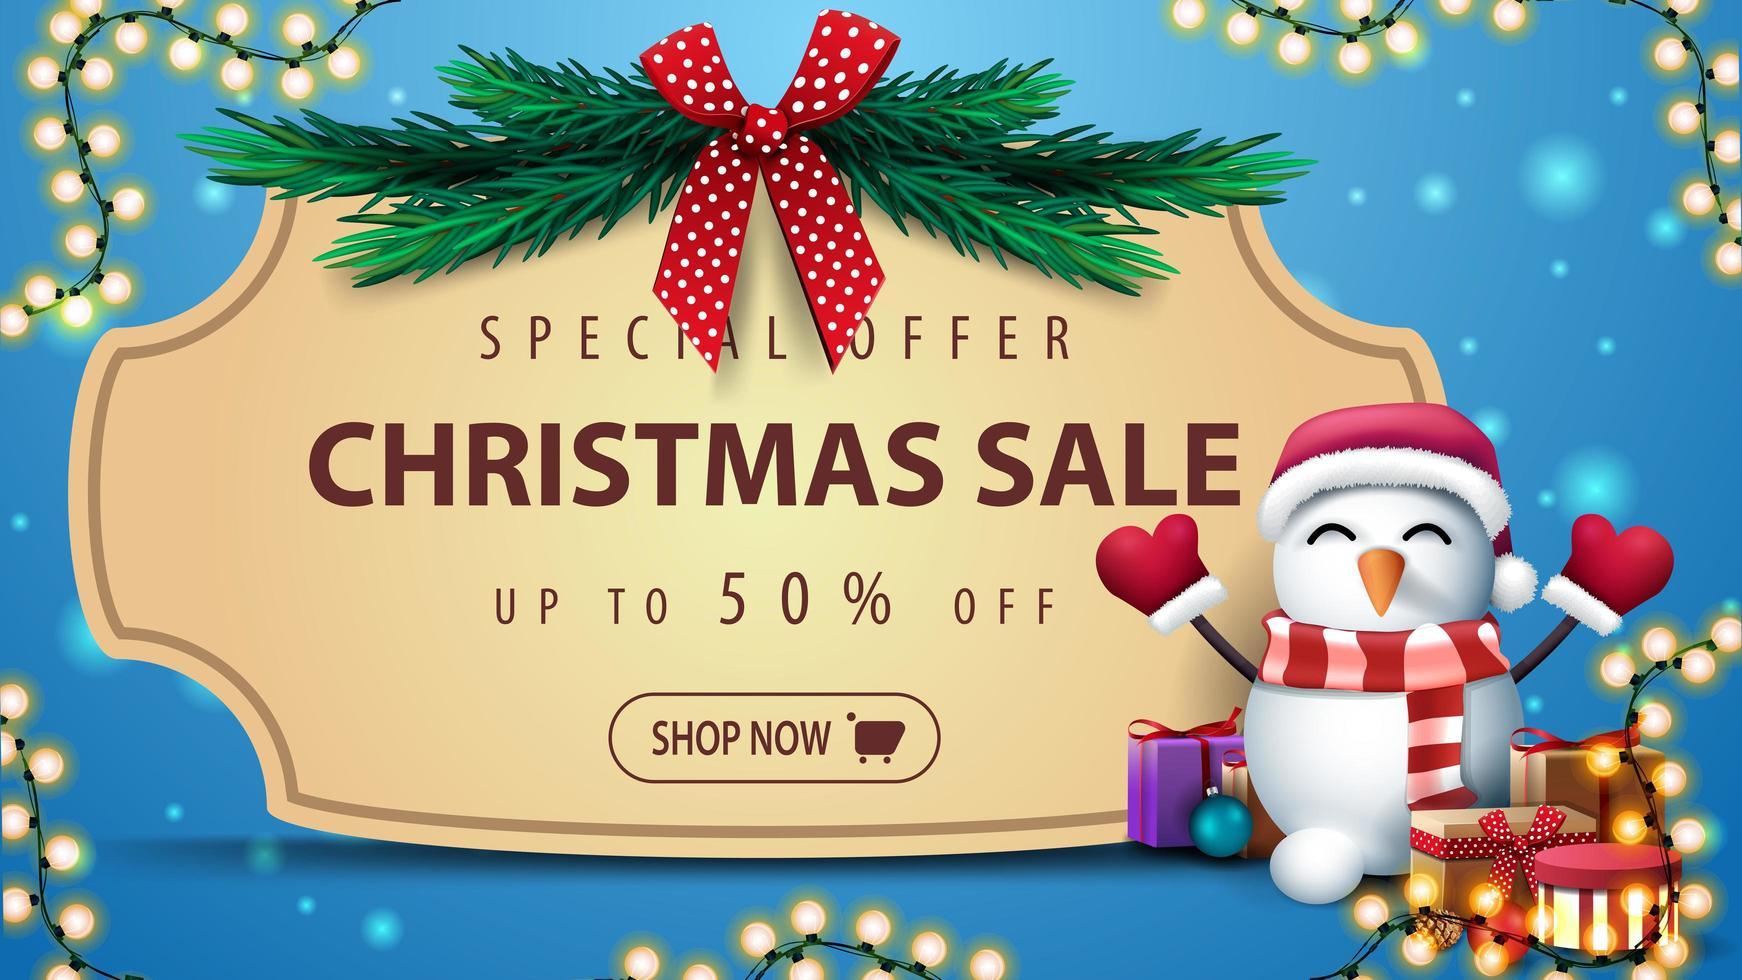 banner met vintage frame en kerstboomtakken vector